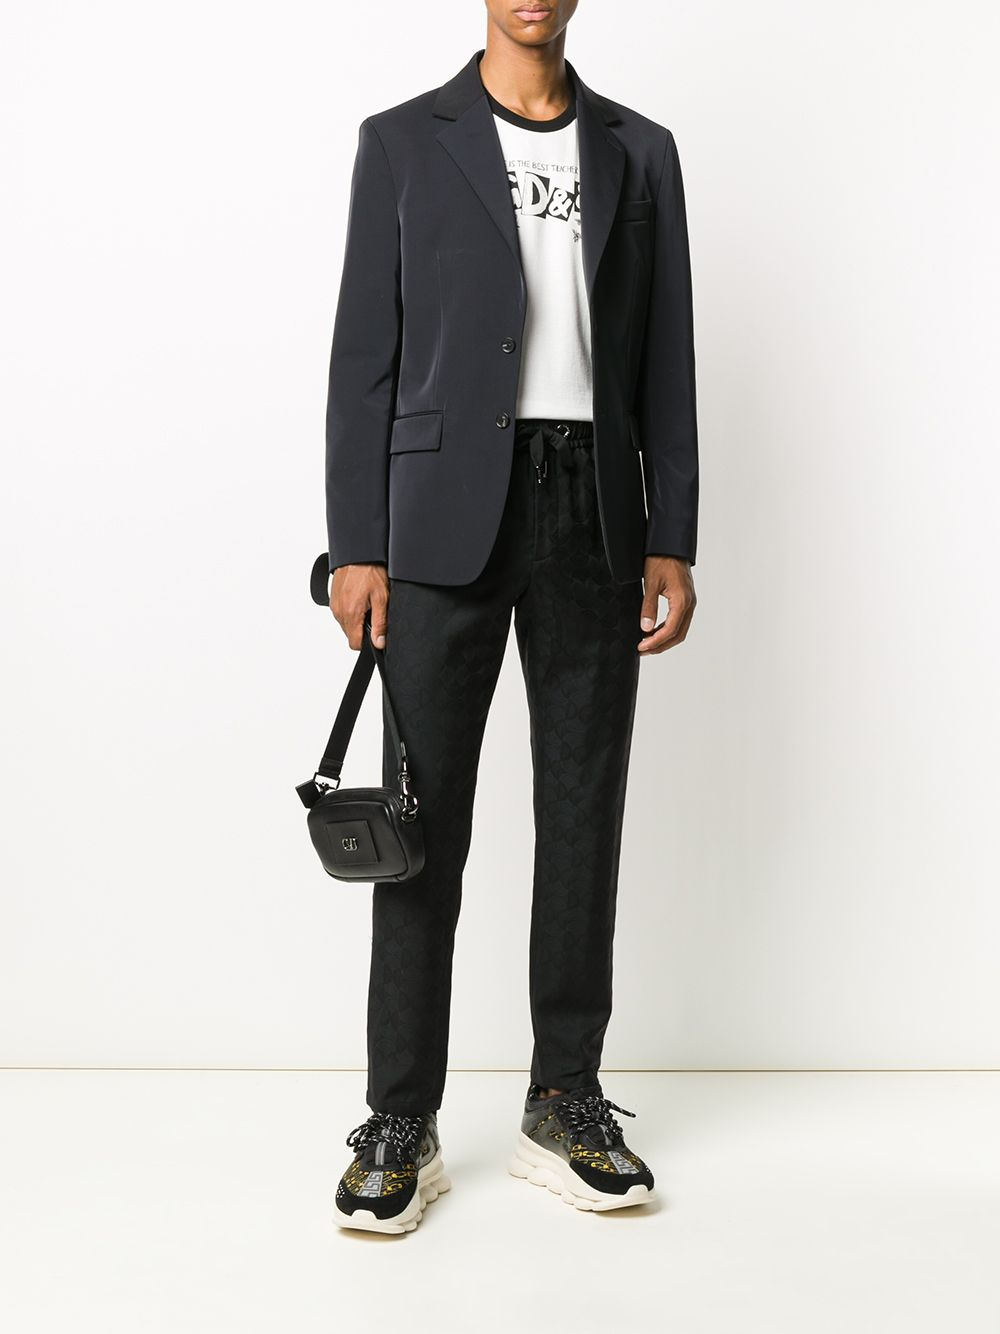 t.shirt bianca in cotone con stampa multilogo nera D&G DOLCE & GABBANA | T-shirt | G8JX7T-FI733HA2GT